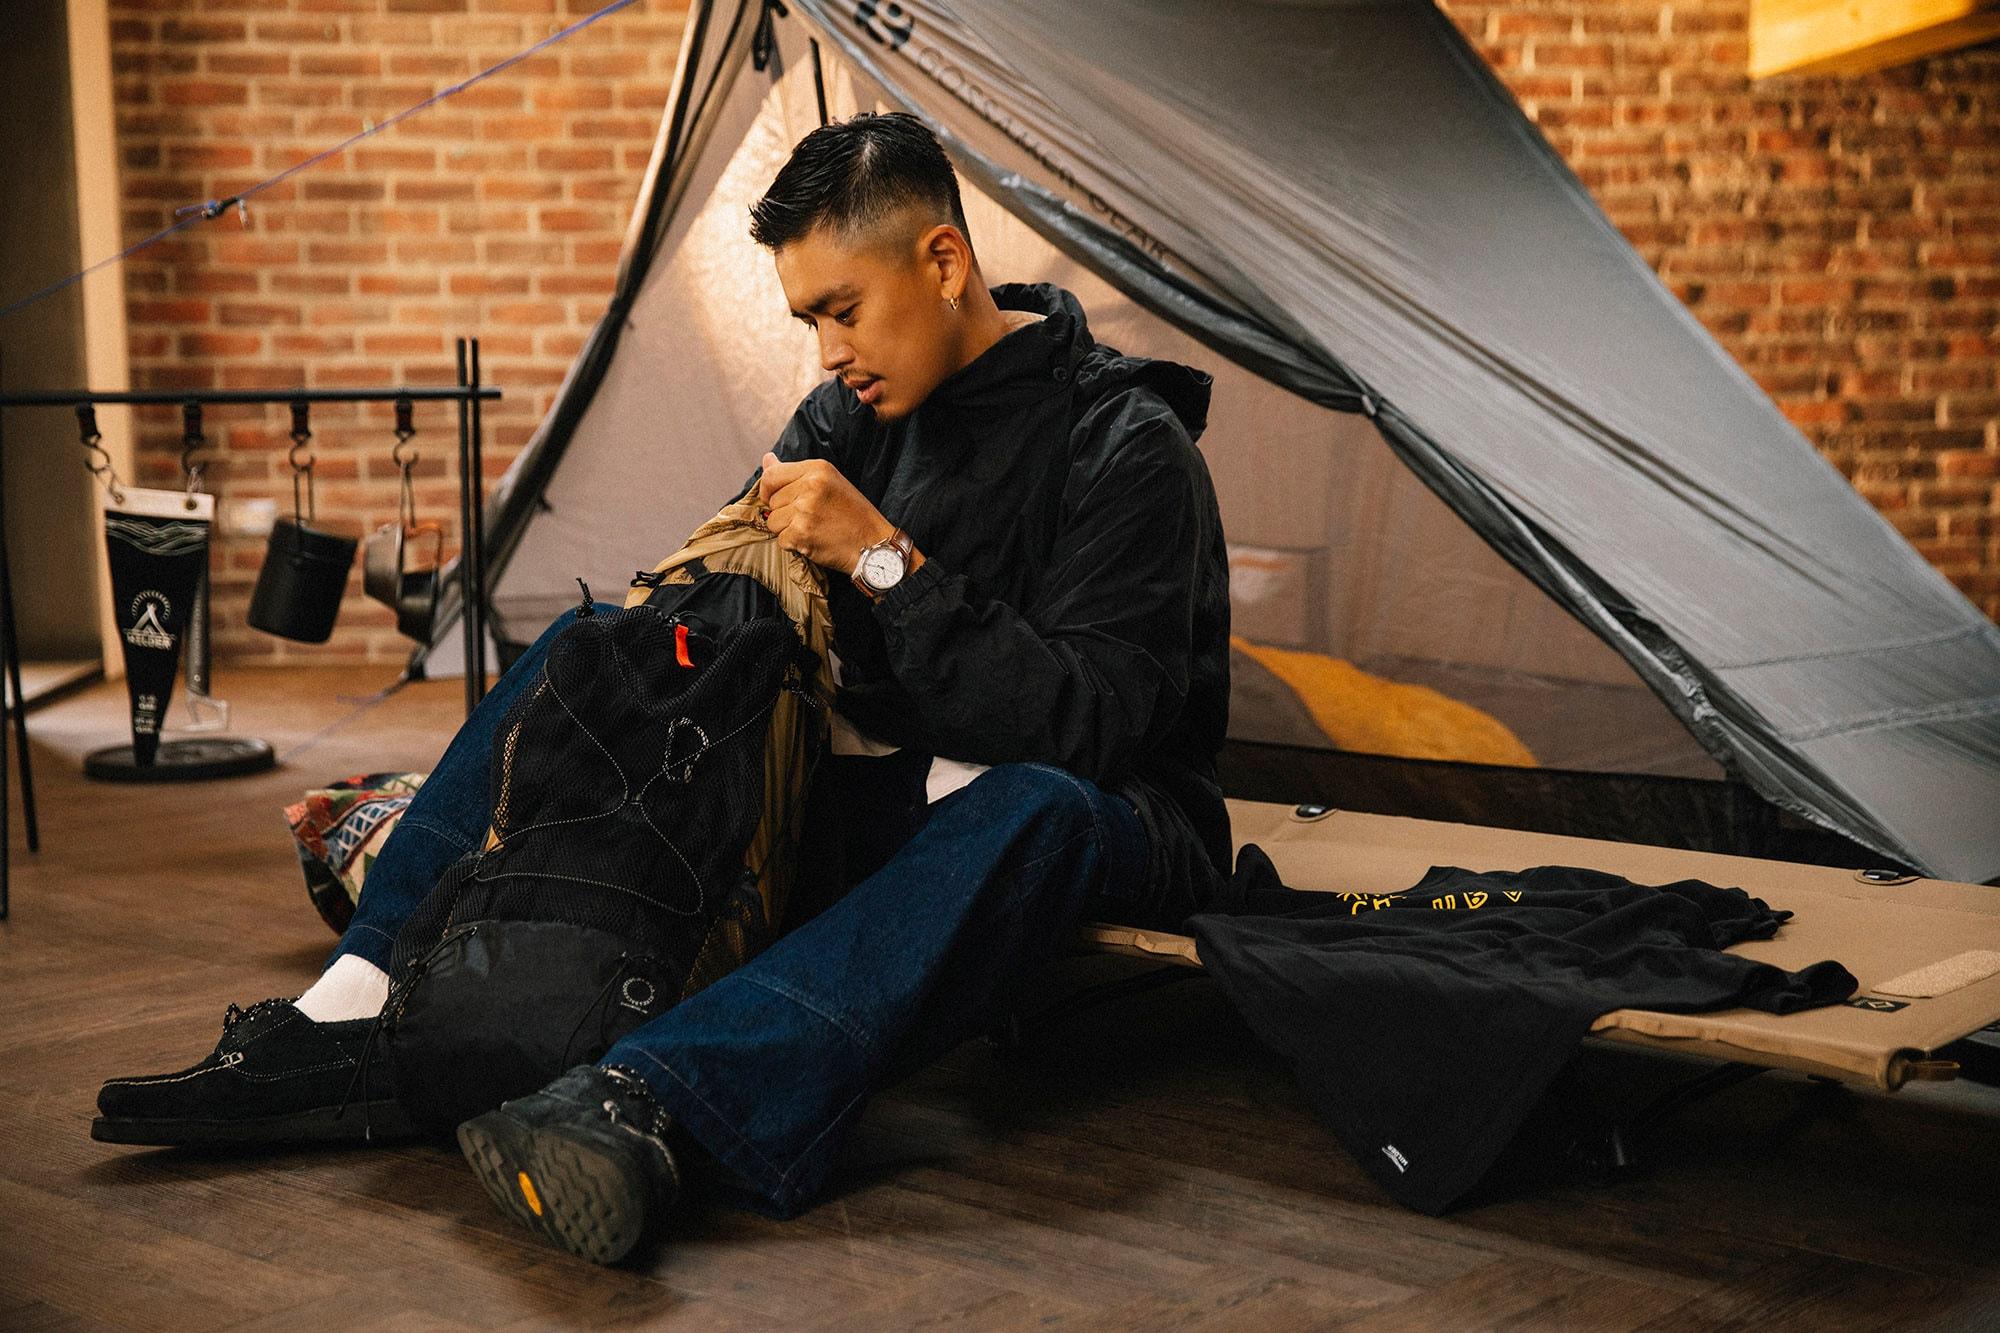 專訪冒險家 WILDER Marc:「每次的 Outdoor 行程,都是一趟冒險的準備。」 STUDIO VISITS